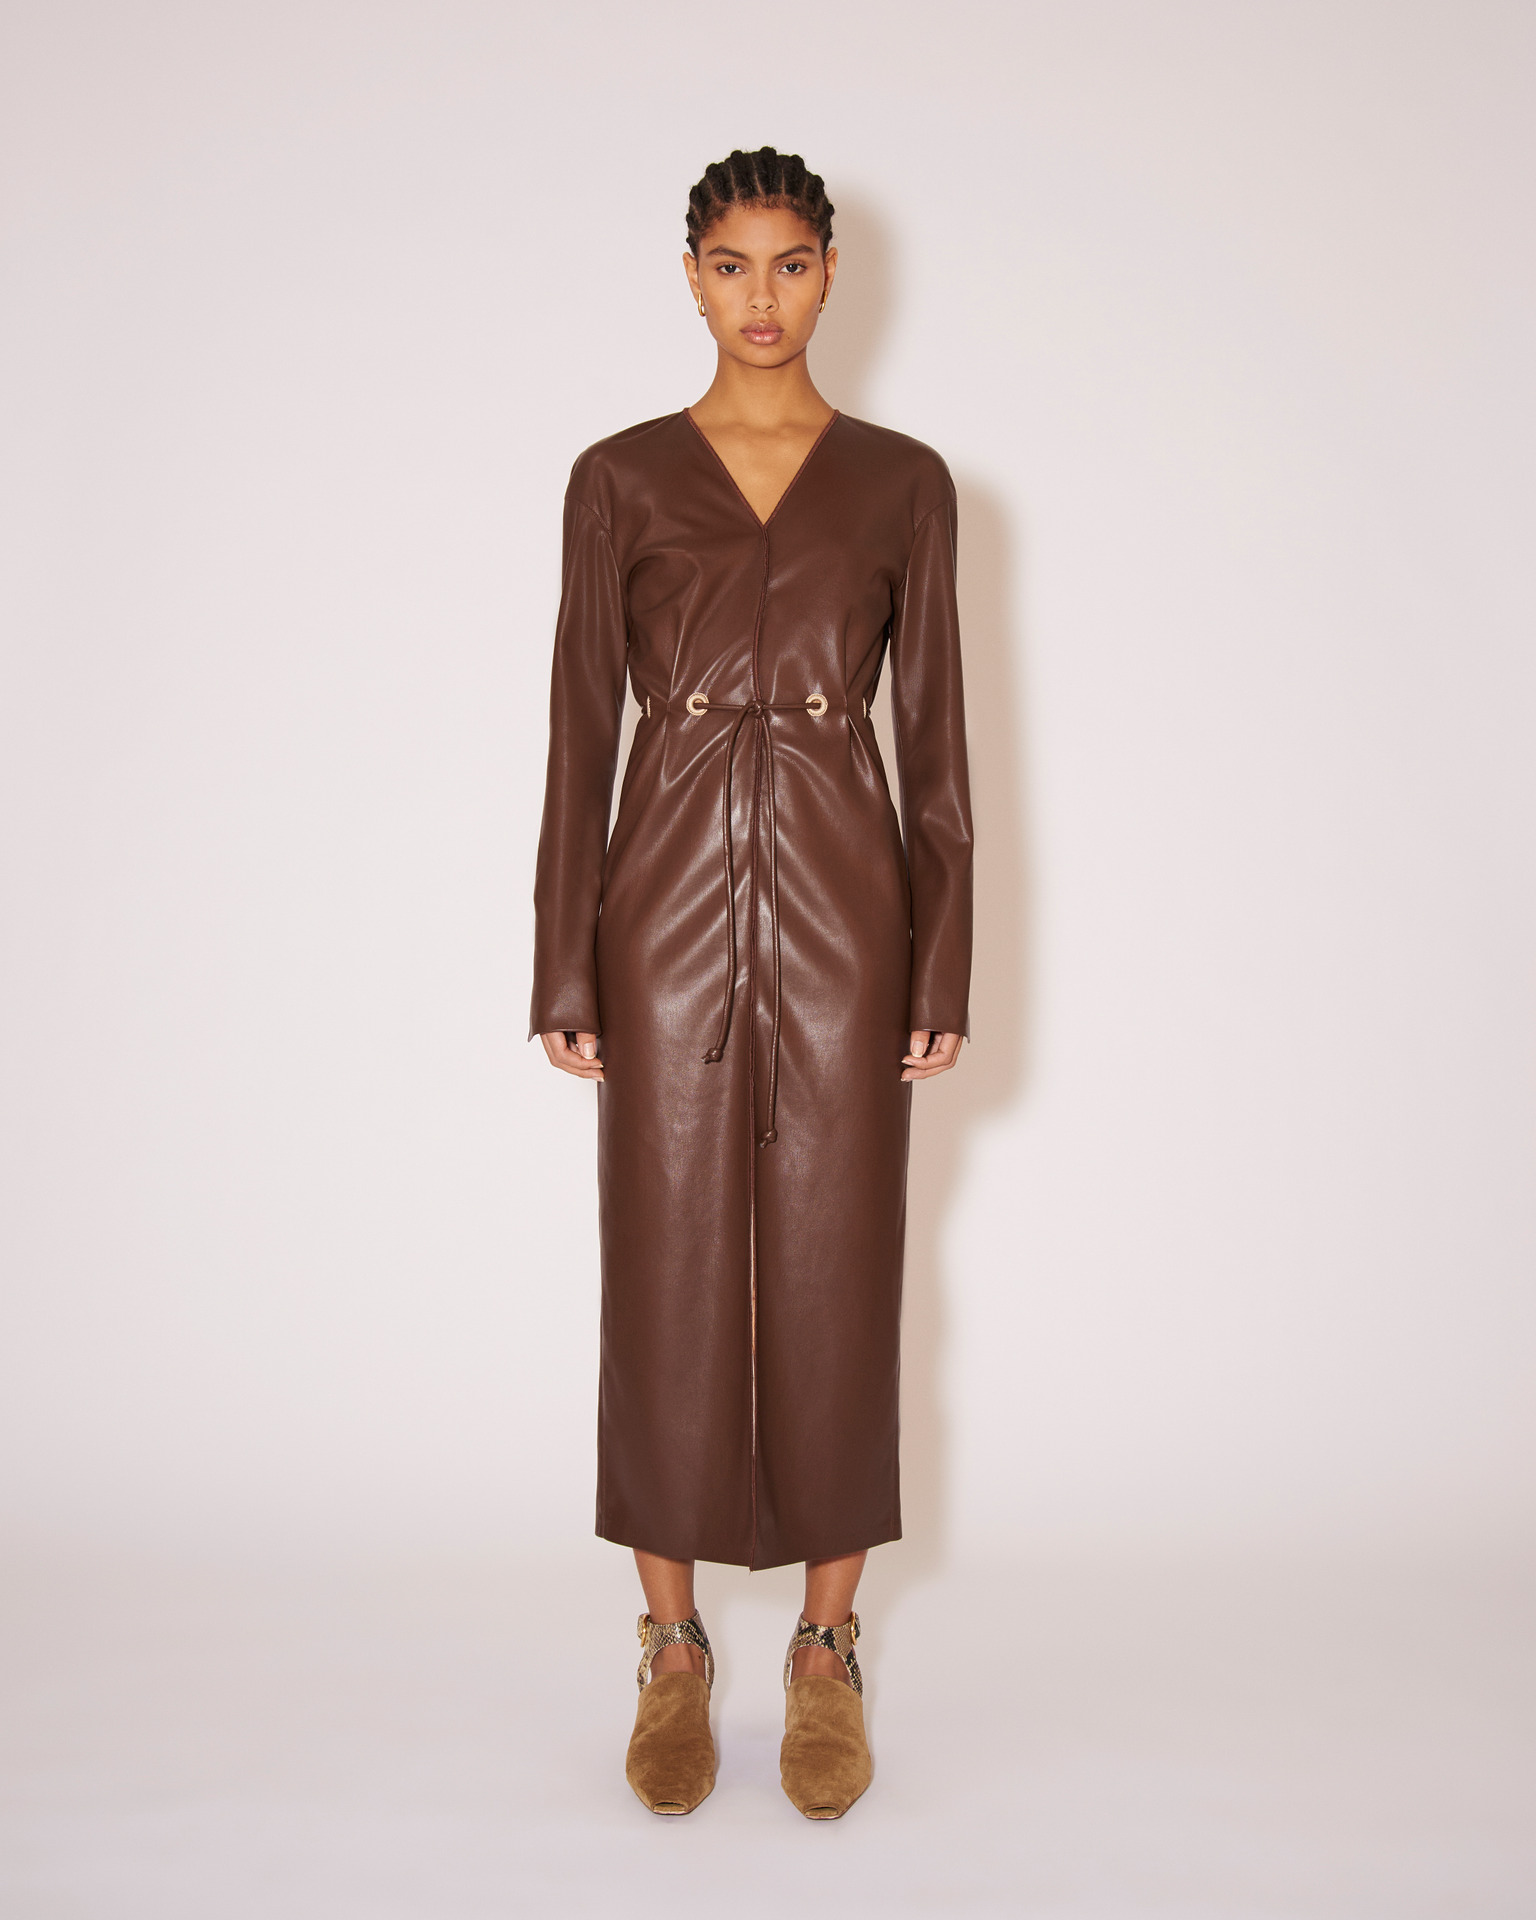 Nanushka EDEL - Vegan leather tie-waist midi dress - Dark brown - XS